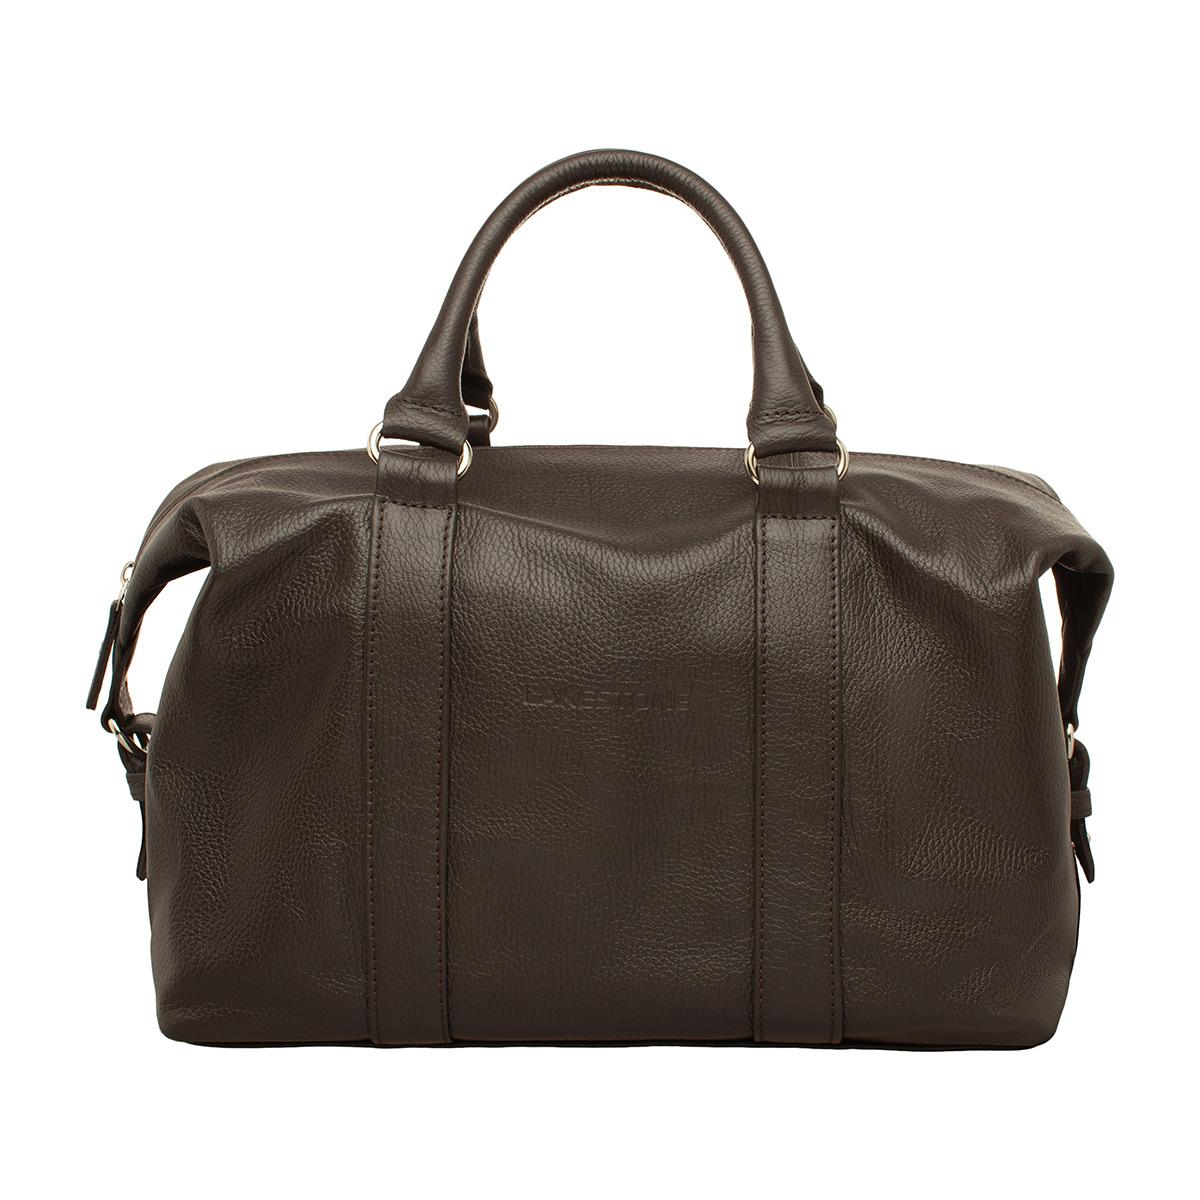 Фото - Кожаная спортивная сумка Calcott Brown